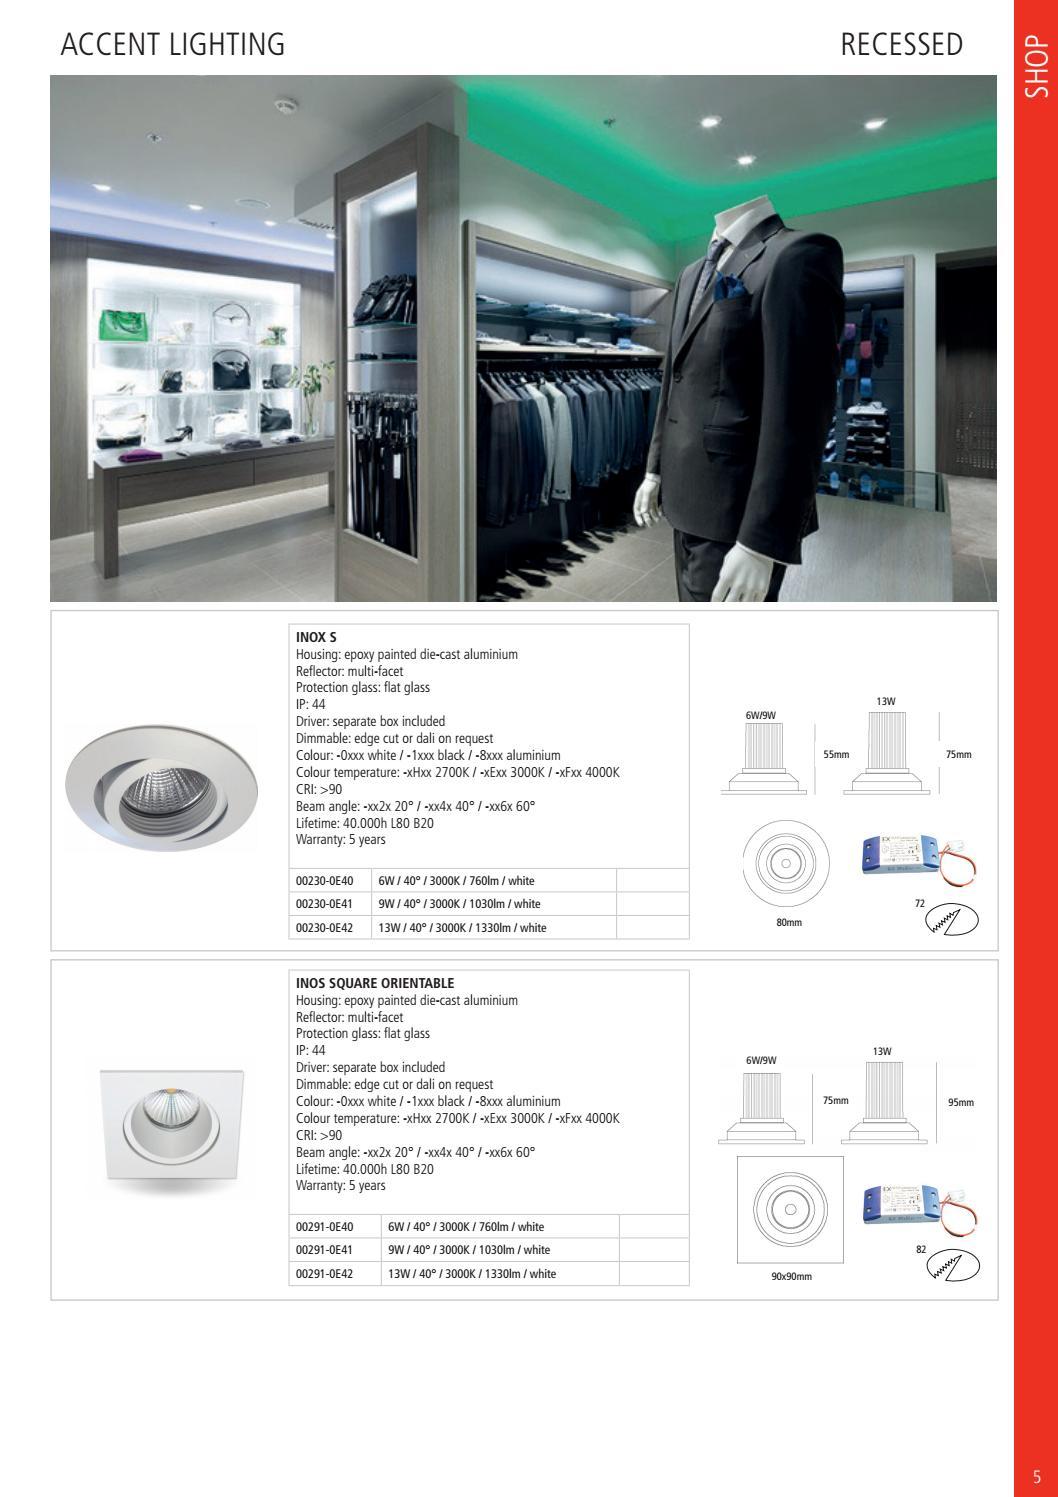 Euro-Luce Catalogue 2018 by euro-luce - issuu